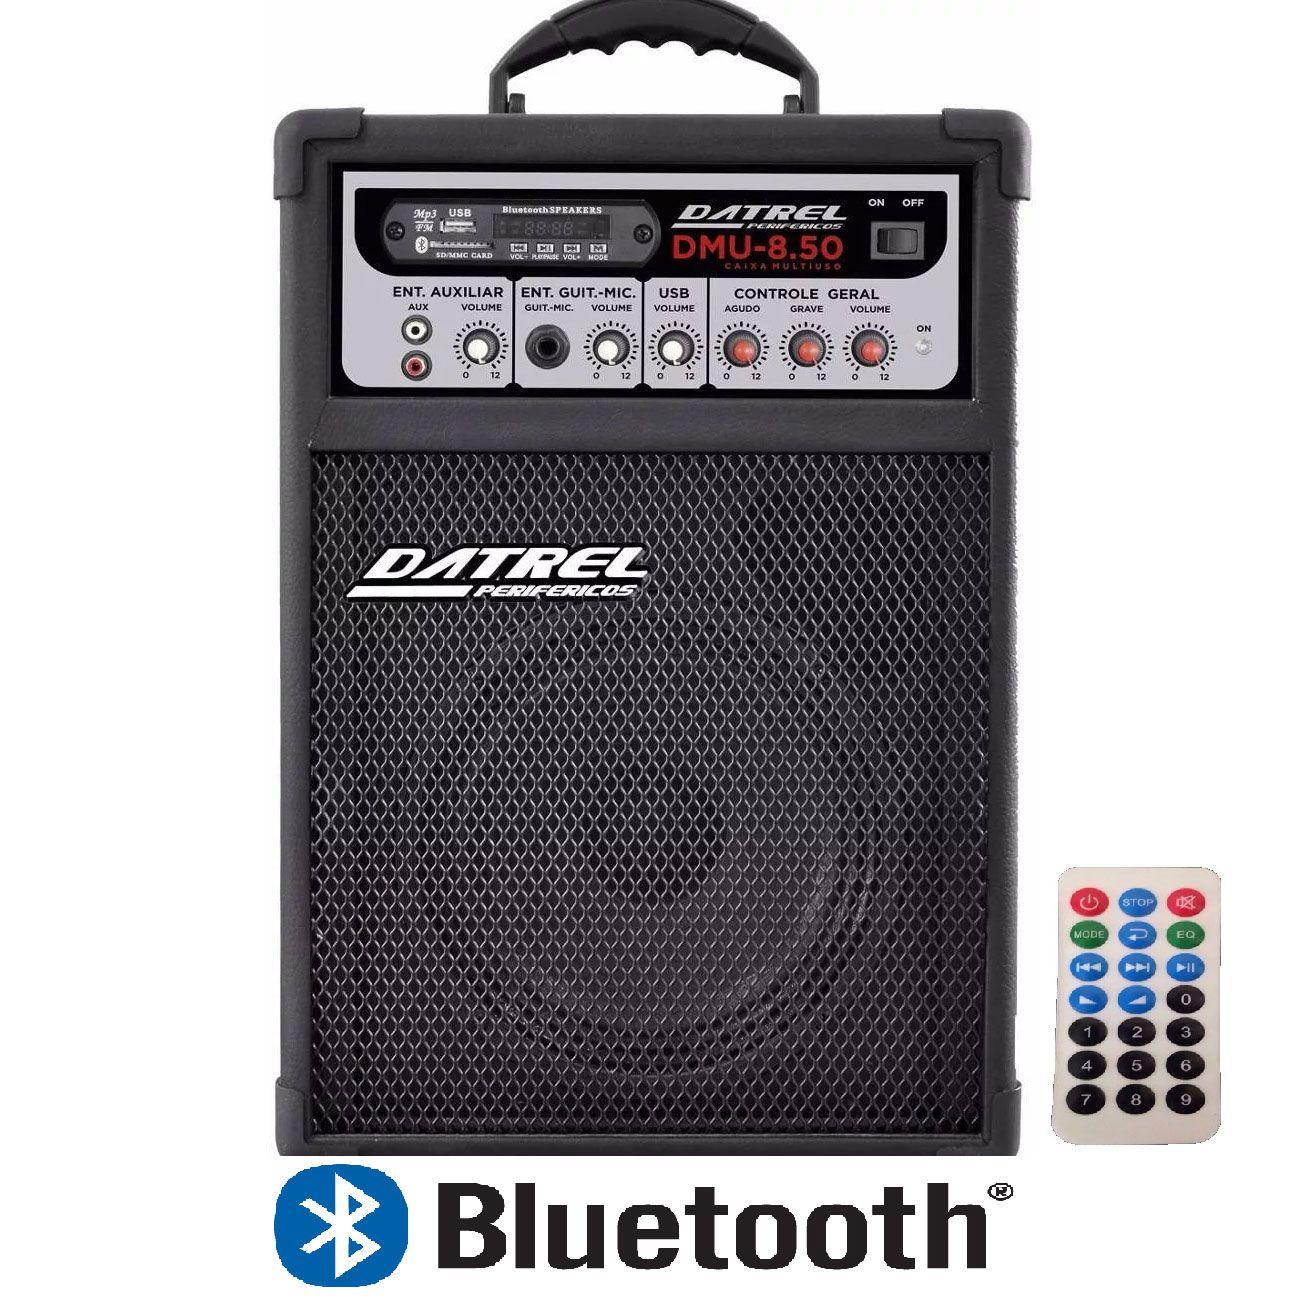 Caixa Amplificada Datrel Dmu8.50 Bluetooth Usb/Cd/Fm C/Controle Remoto Multiuso 50wrms